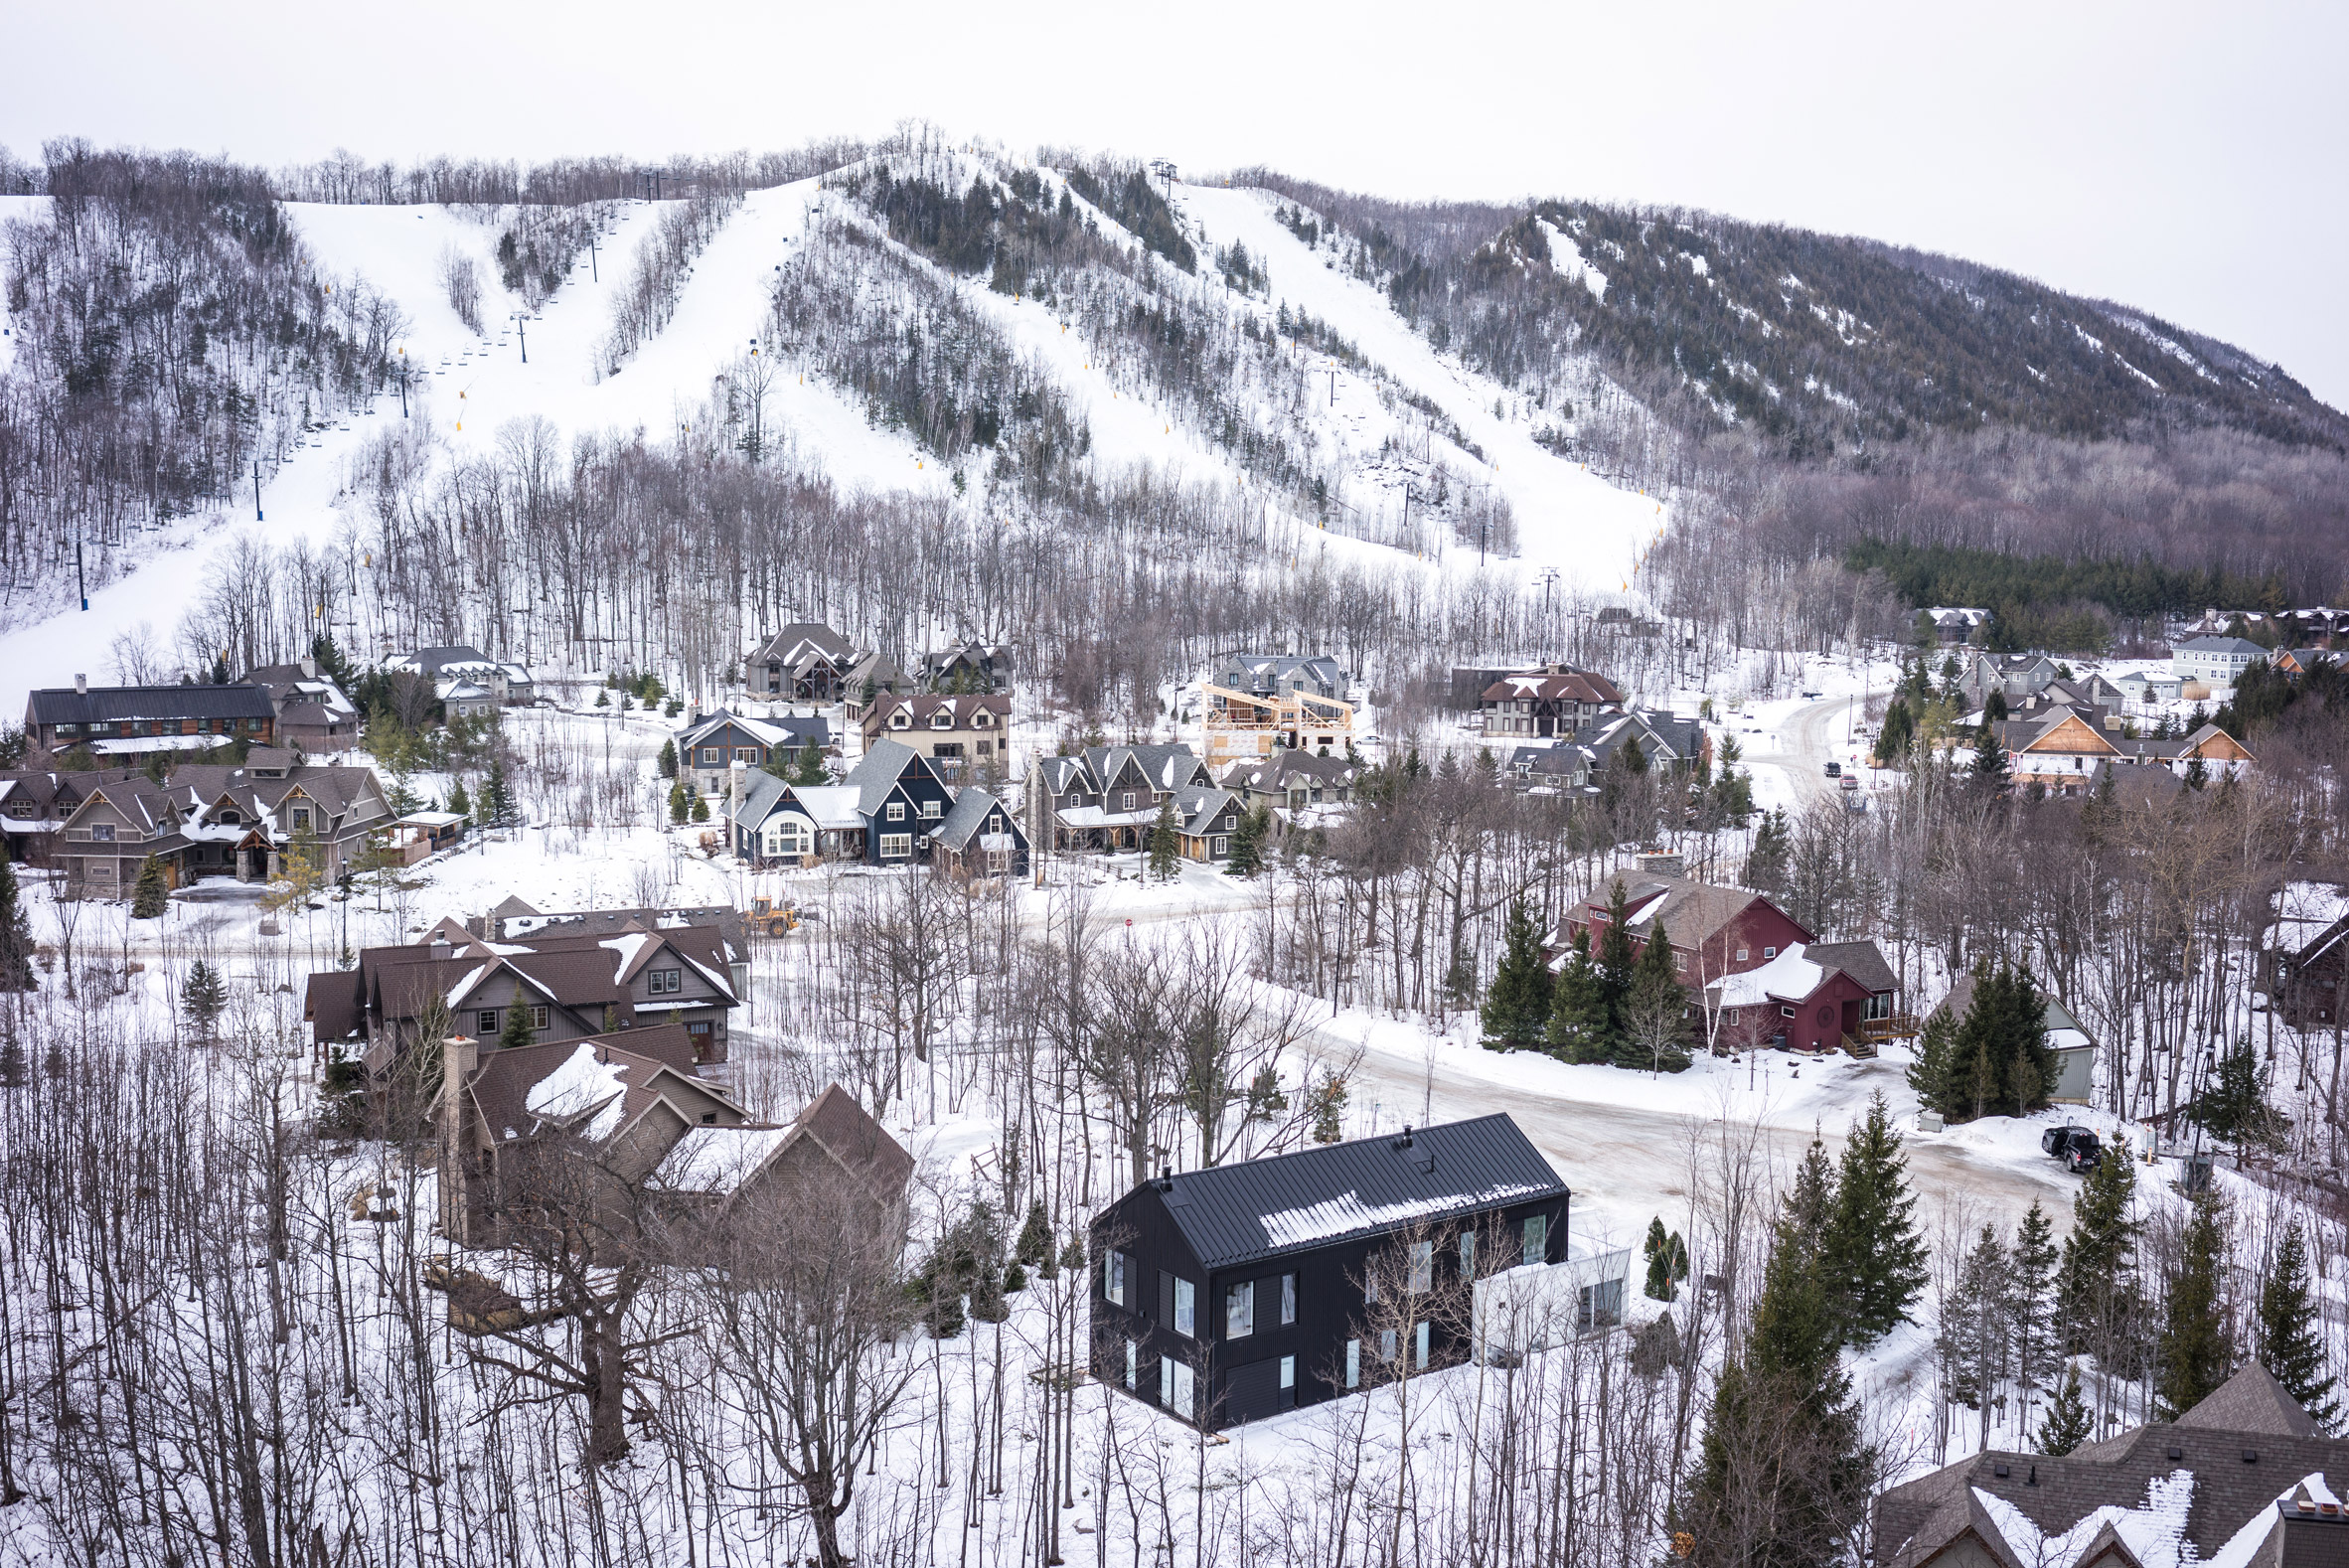 Monochrome Canadian ski lodge by Atelier Kastelic Buffey echoes traditional farmhouses